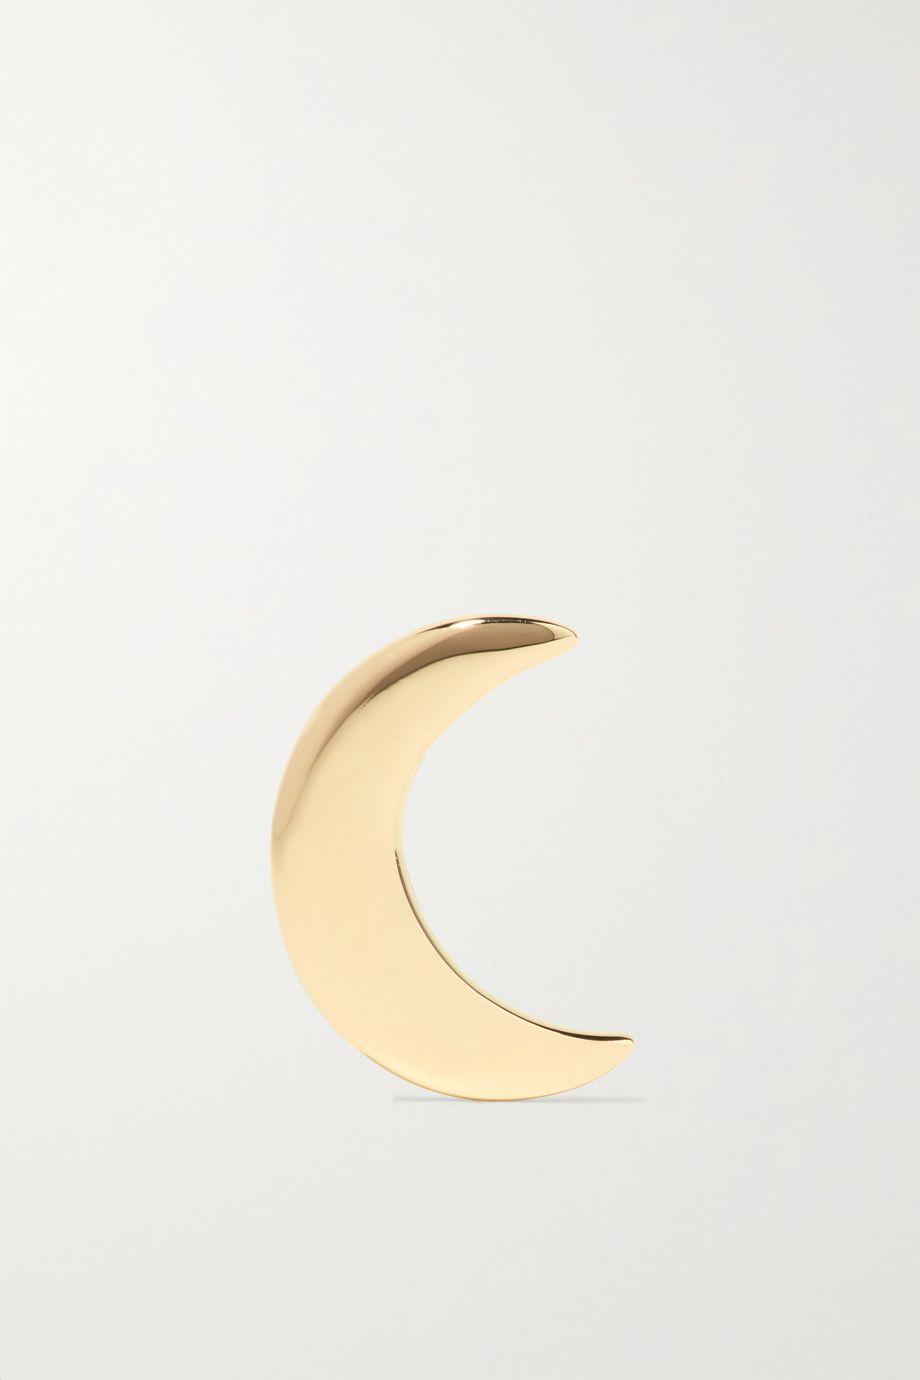 Andrea Fohrman 18-karat gold earring